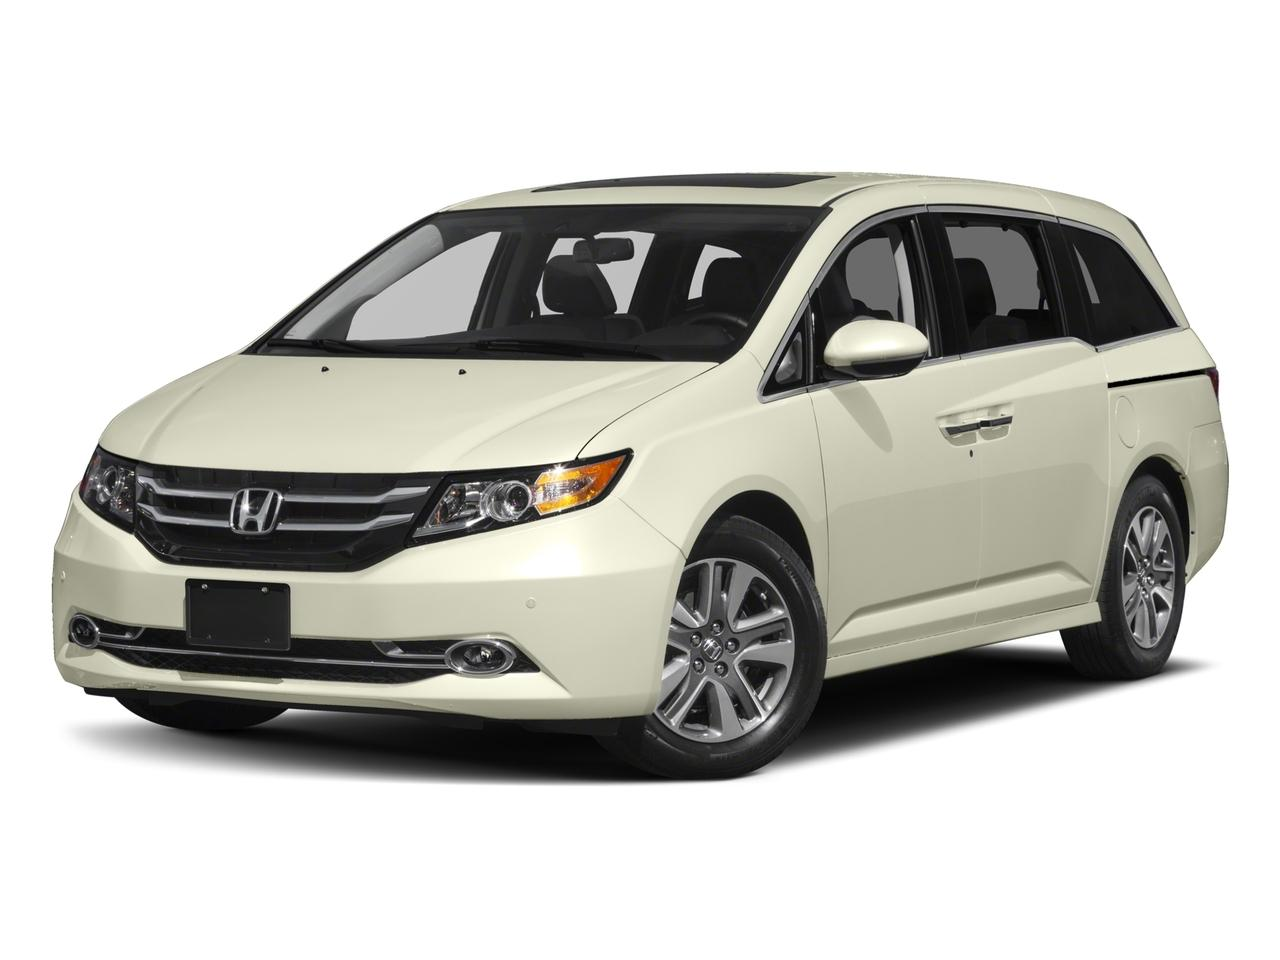 2017 Honda Odyssey Vehicle Photo in Mission, TX 78572